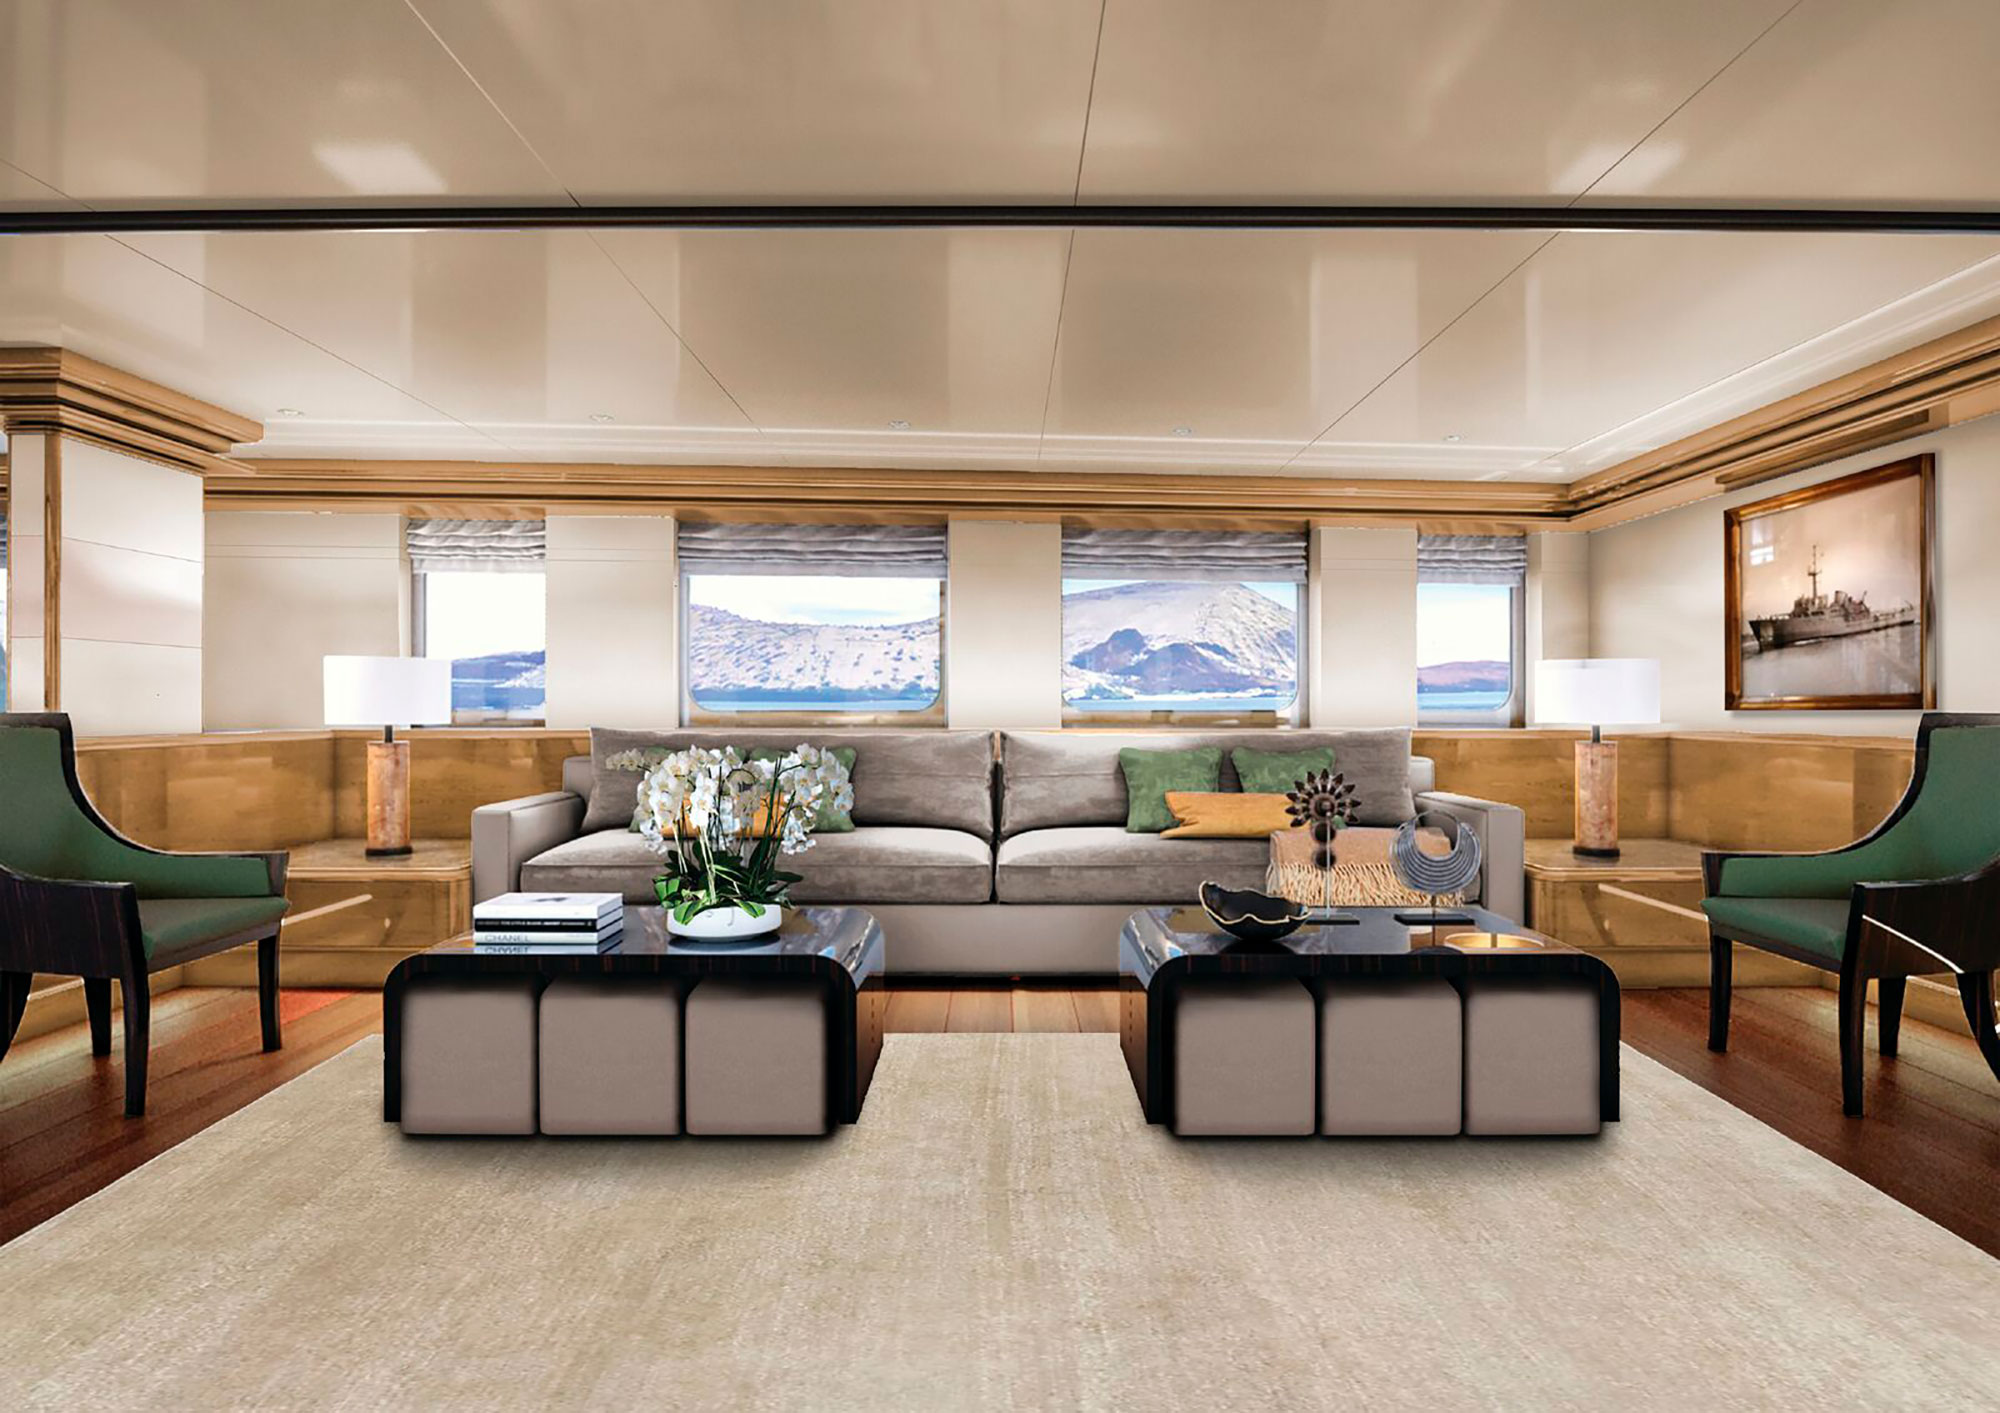 Crucero AQUA BLU de 12 noches - Spice Islands to Raja Ampat - Indonesia- imagen #7